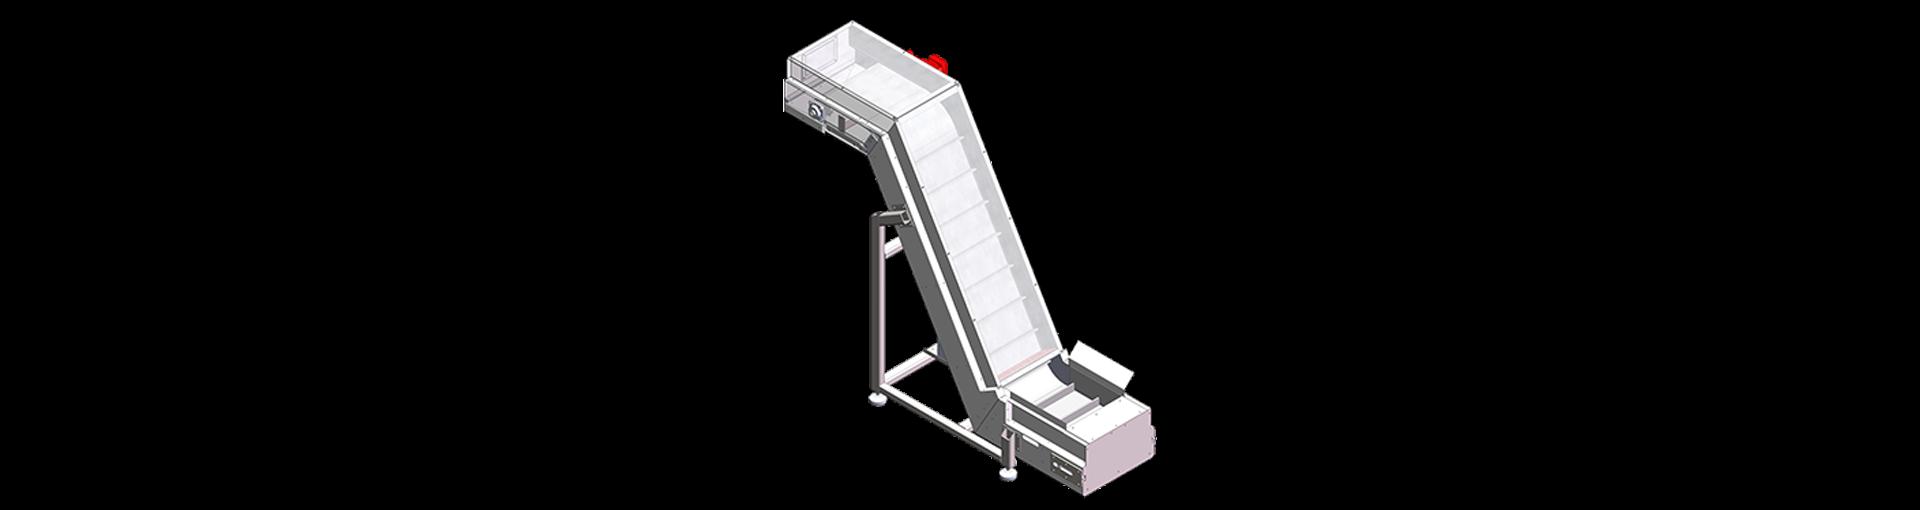 Conveyor System Image